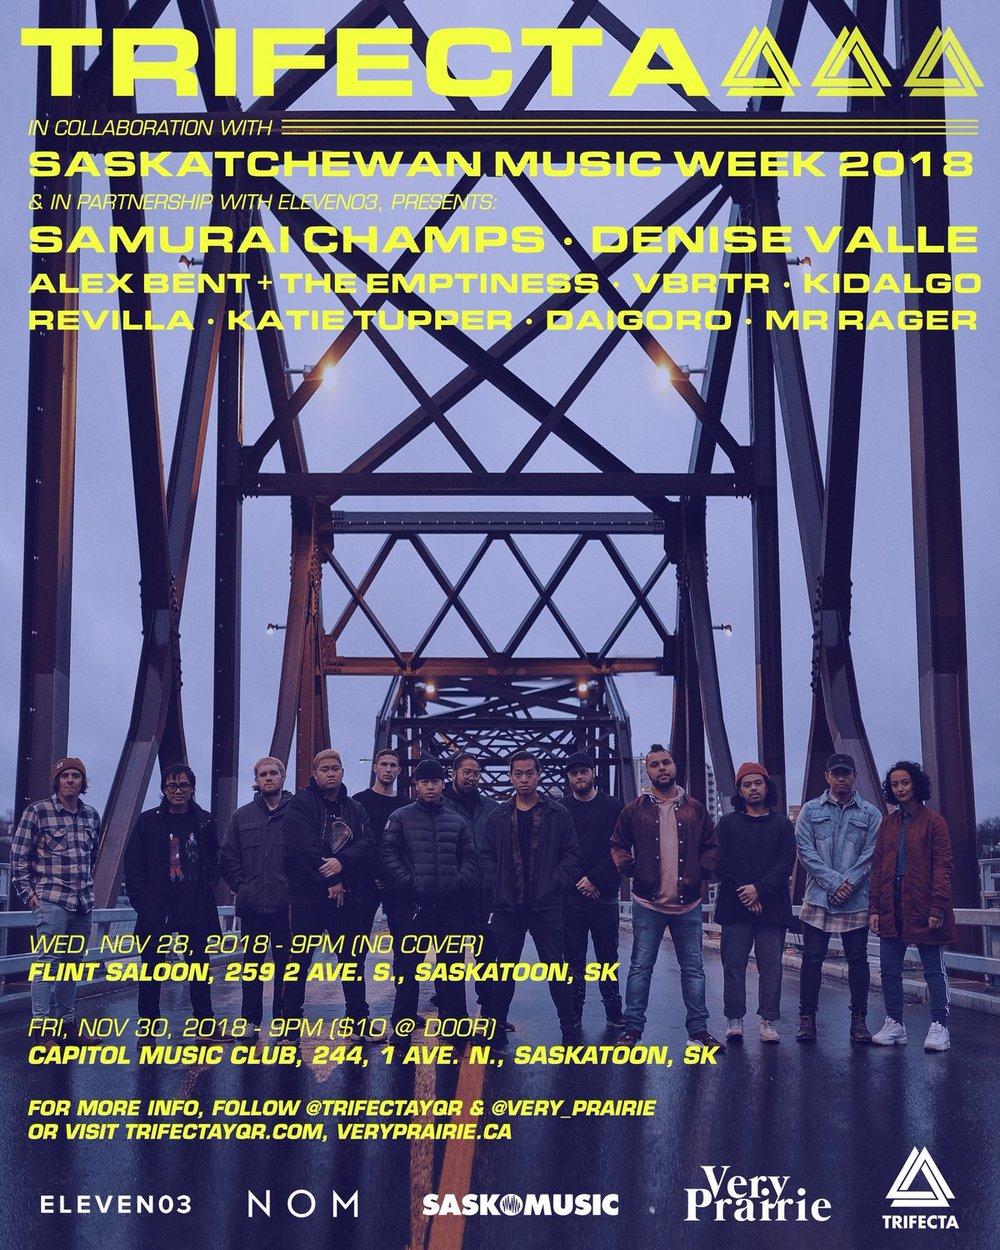 Trifecta SMW Poster-1.jpg